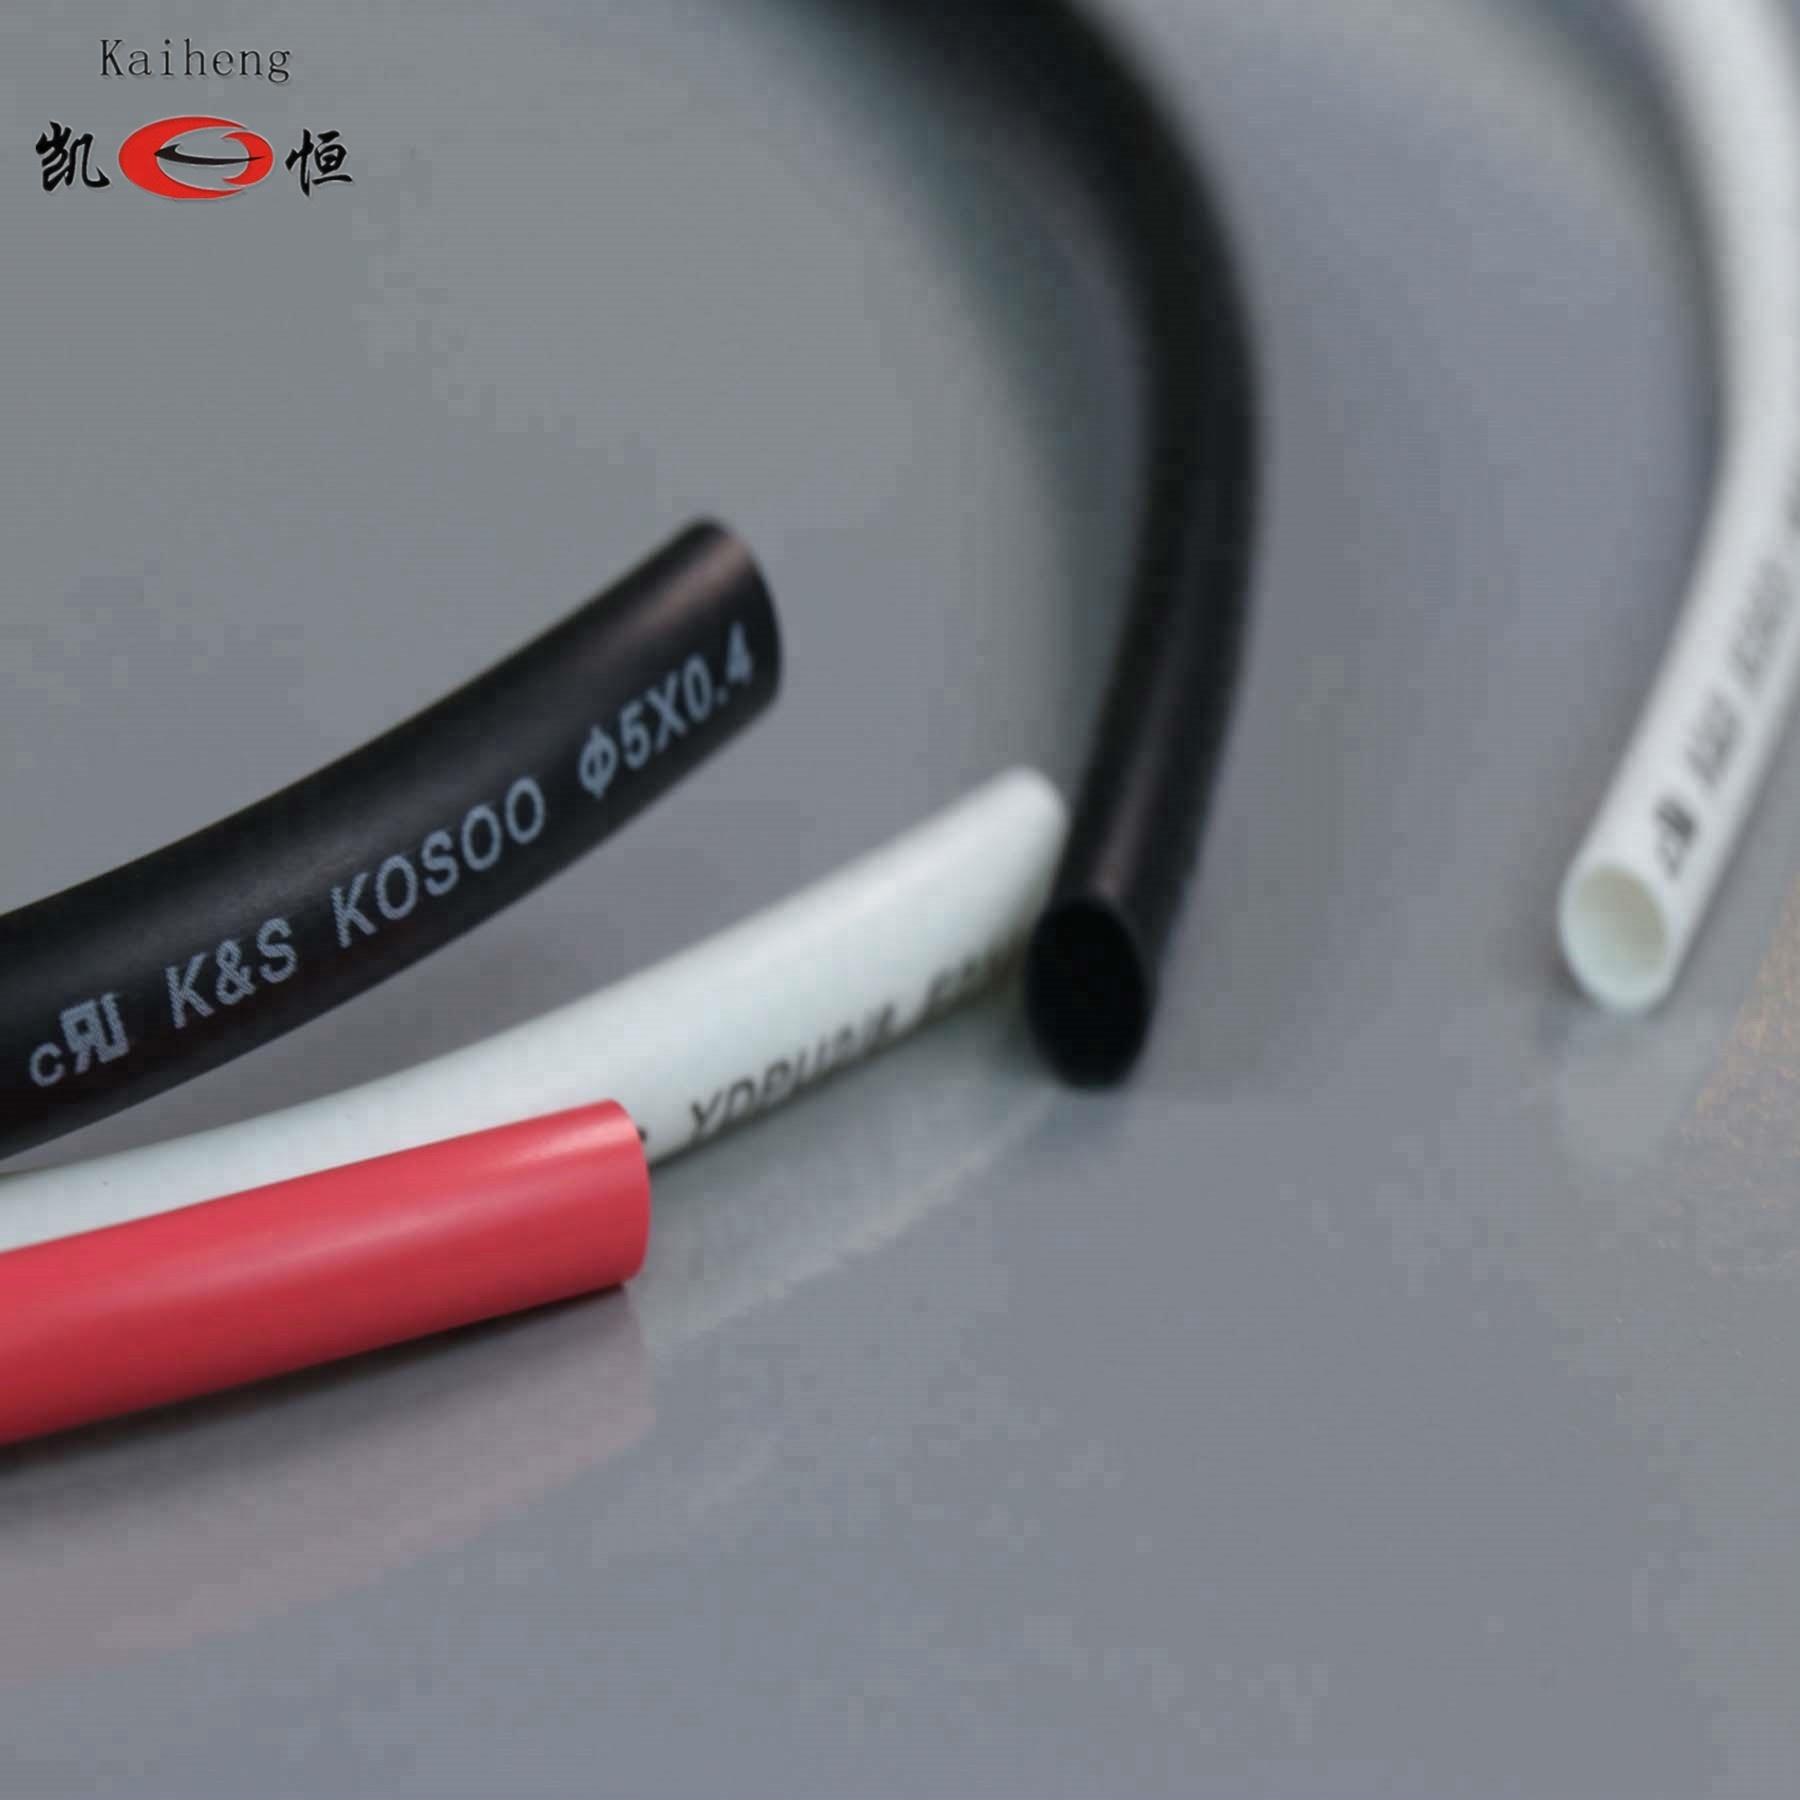 5mmブラック/ホワイト/レッド/イエロー/ブルー/グリーンケーブル絶縁チューブソフトul承認pvcチューブチューブ